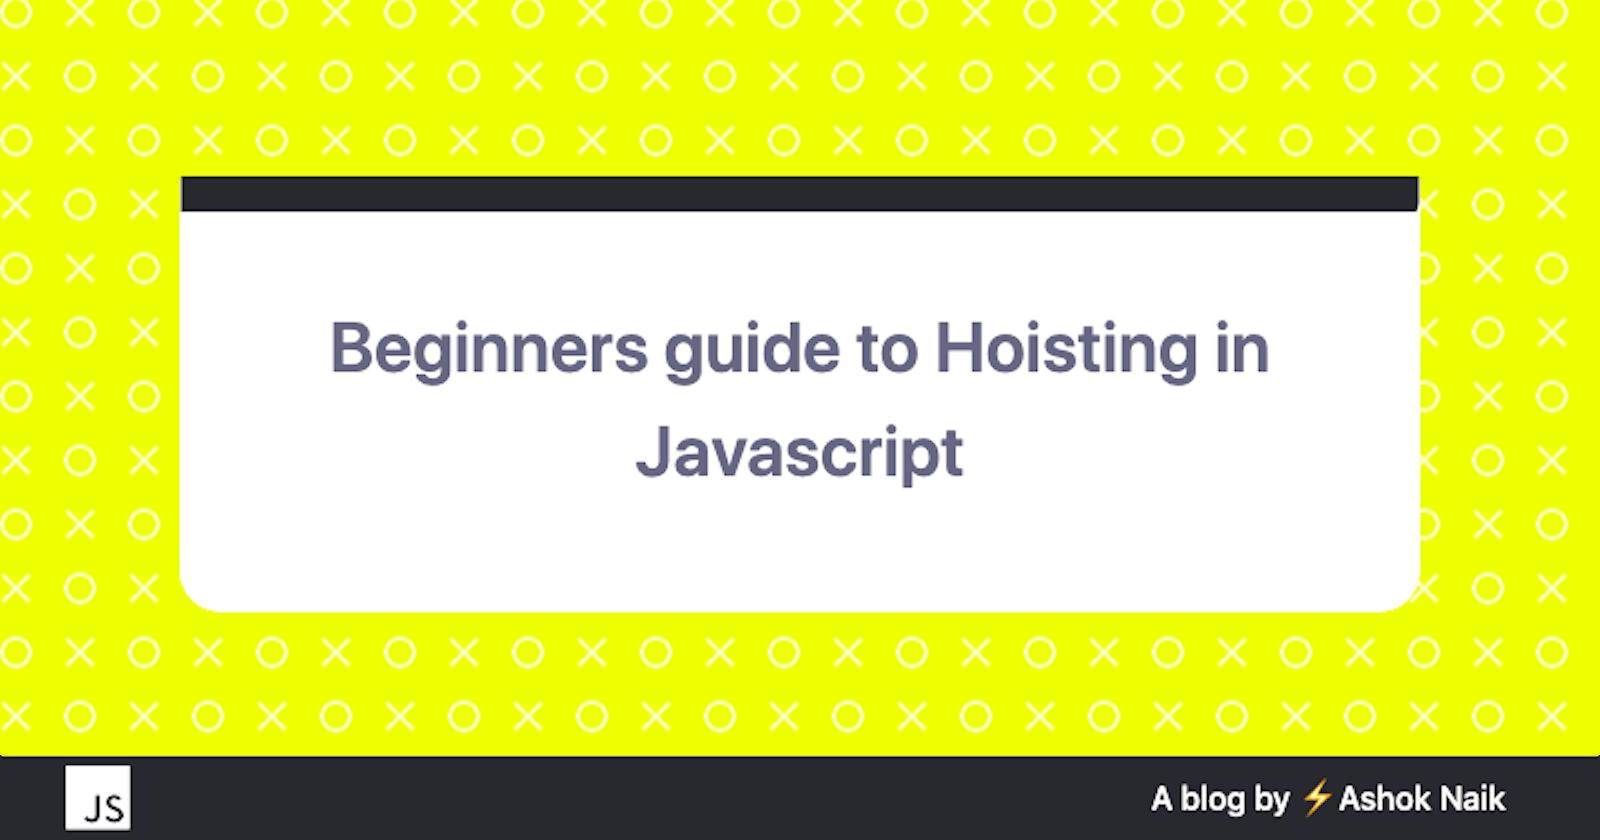 Beginners guide to Hoisting in Javascript